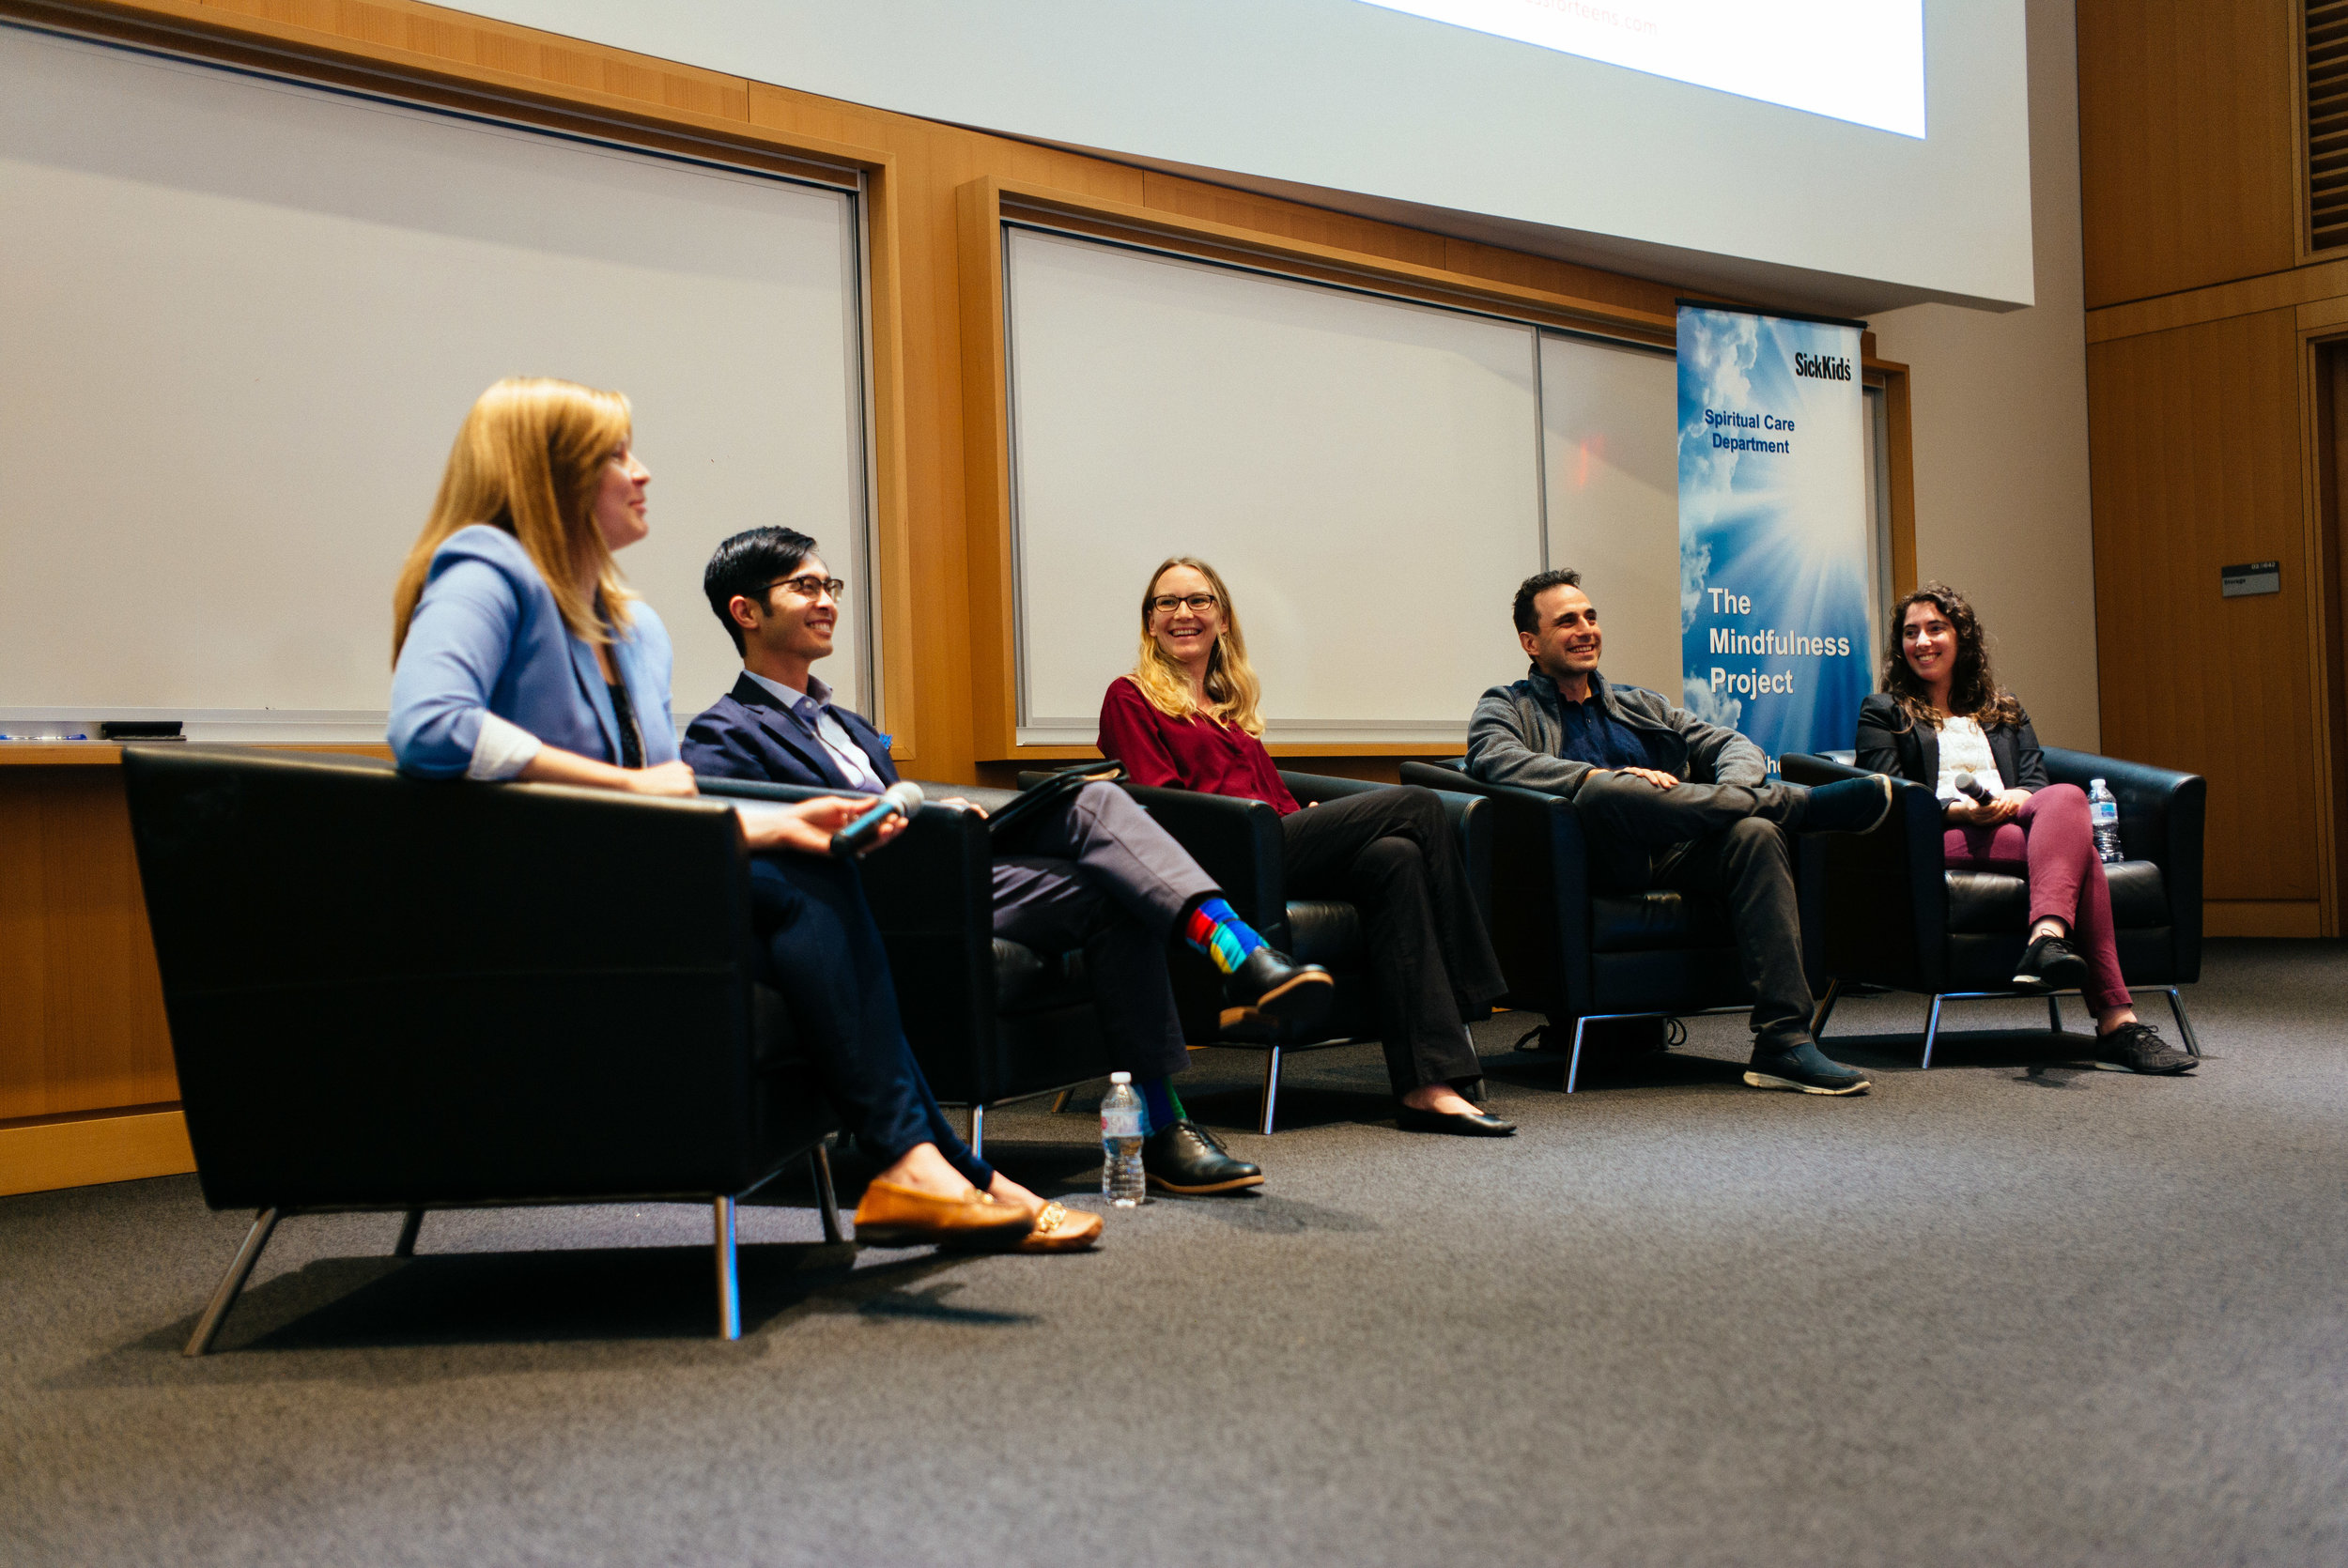 Afternoon panel from left: Sarah Ahola-Kohut, Dzung Vo, Anne Wheeler, Norman Farb, Elli Weisbaum